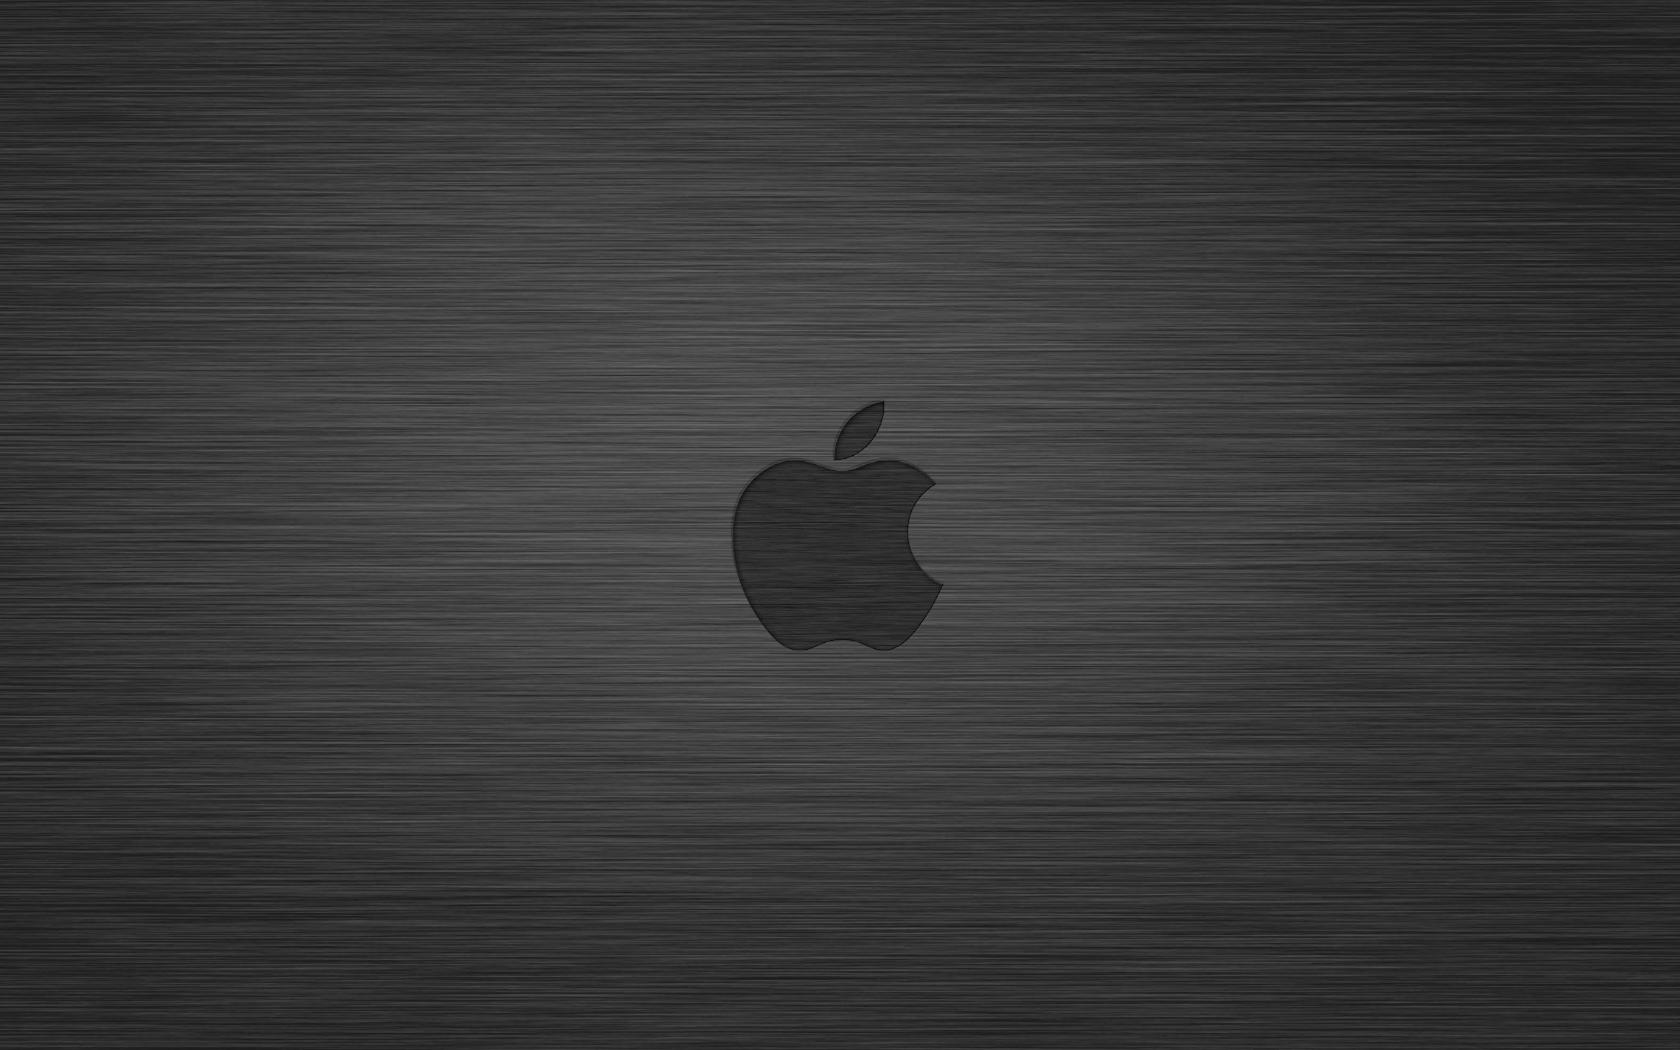 steel apple by arthursmith